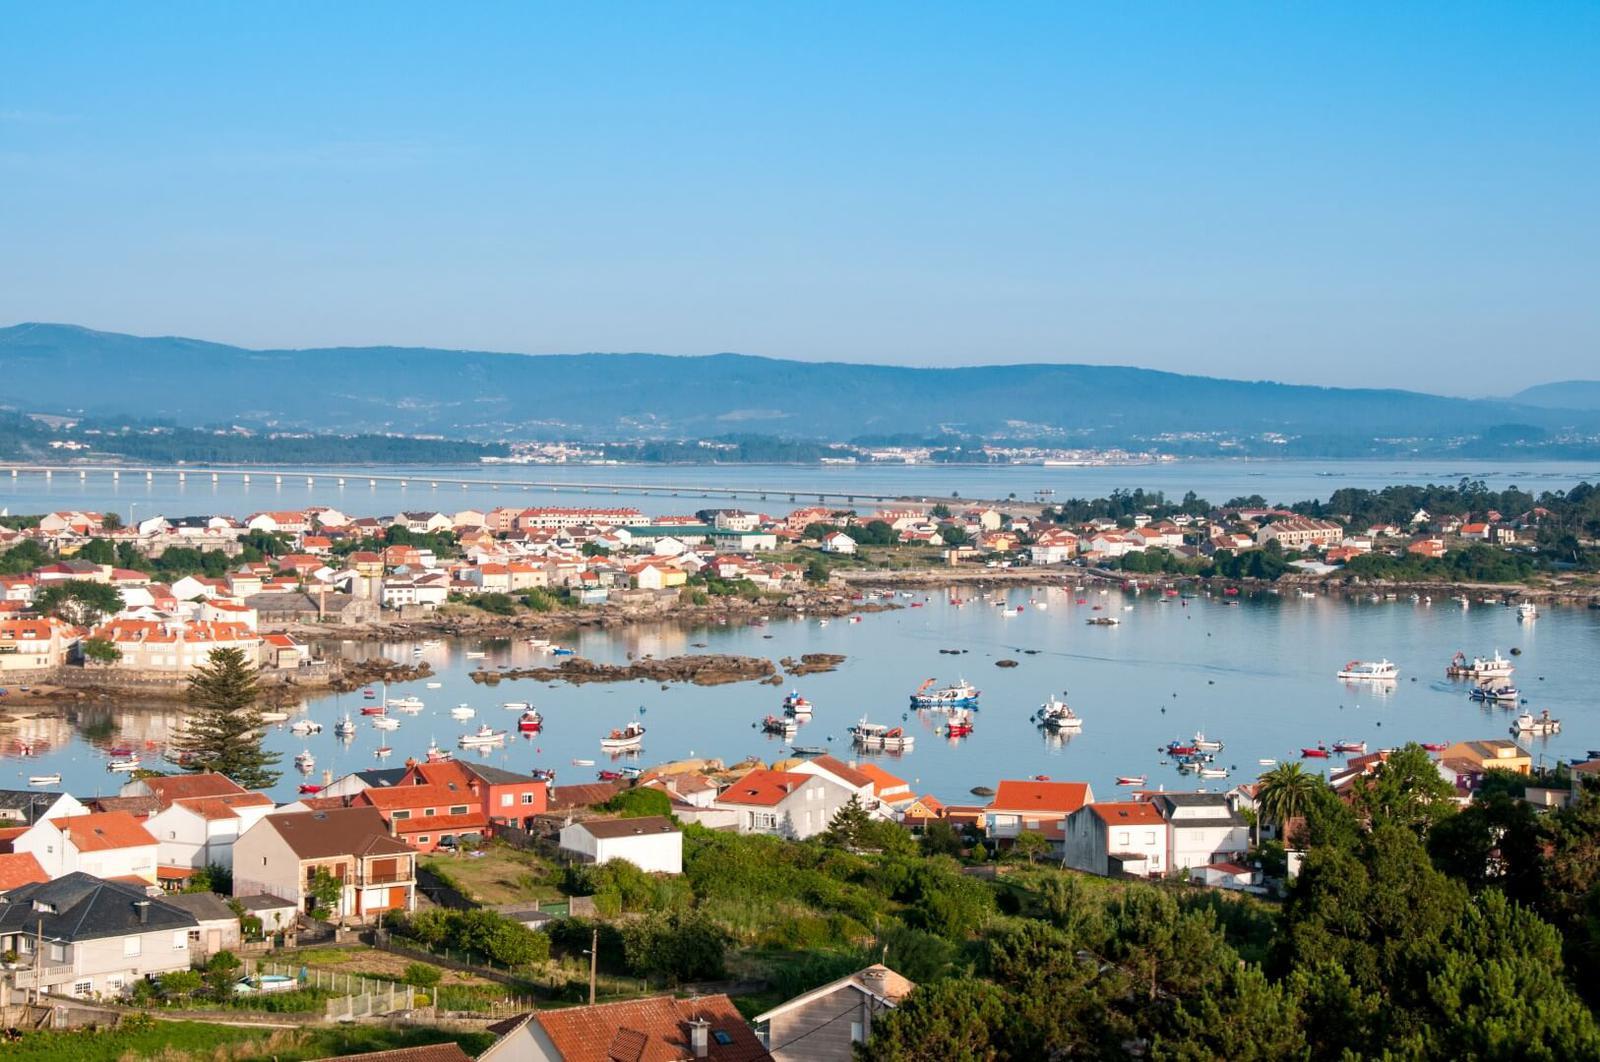 Spain_Galicia_Pontevedra_Arousa Island_Fotolia (1)